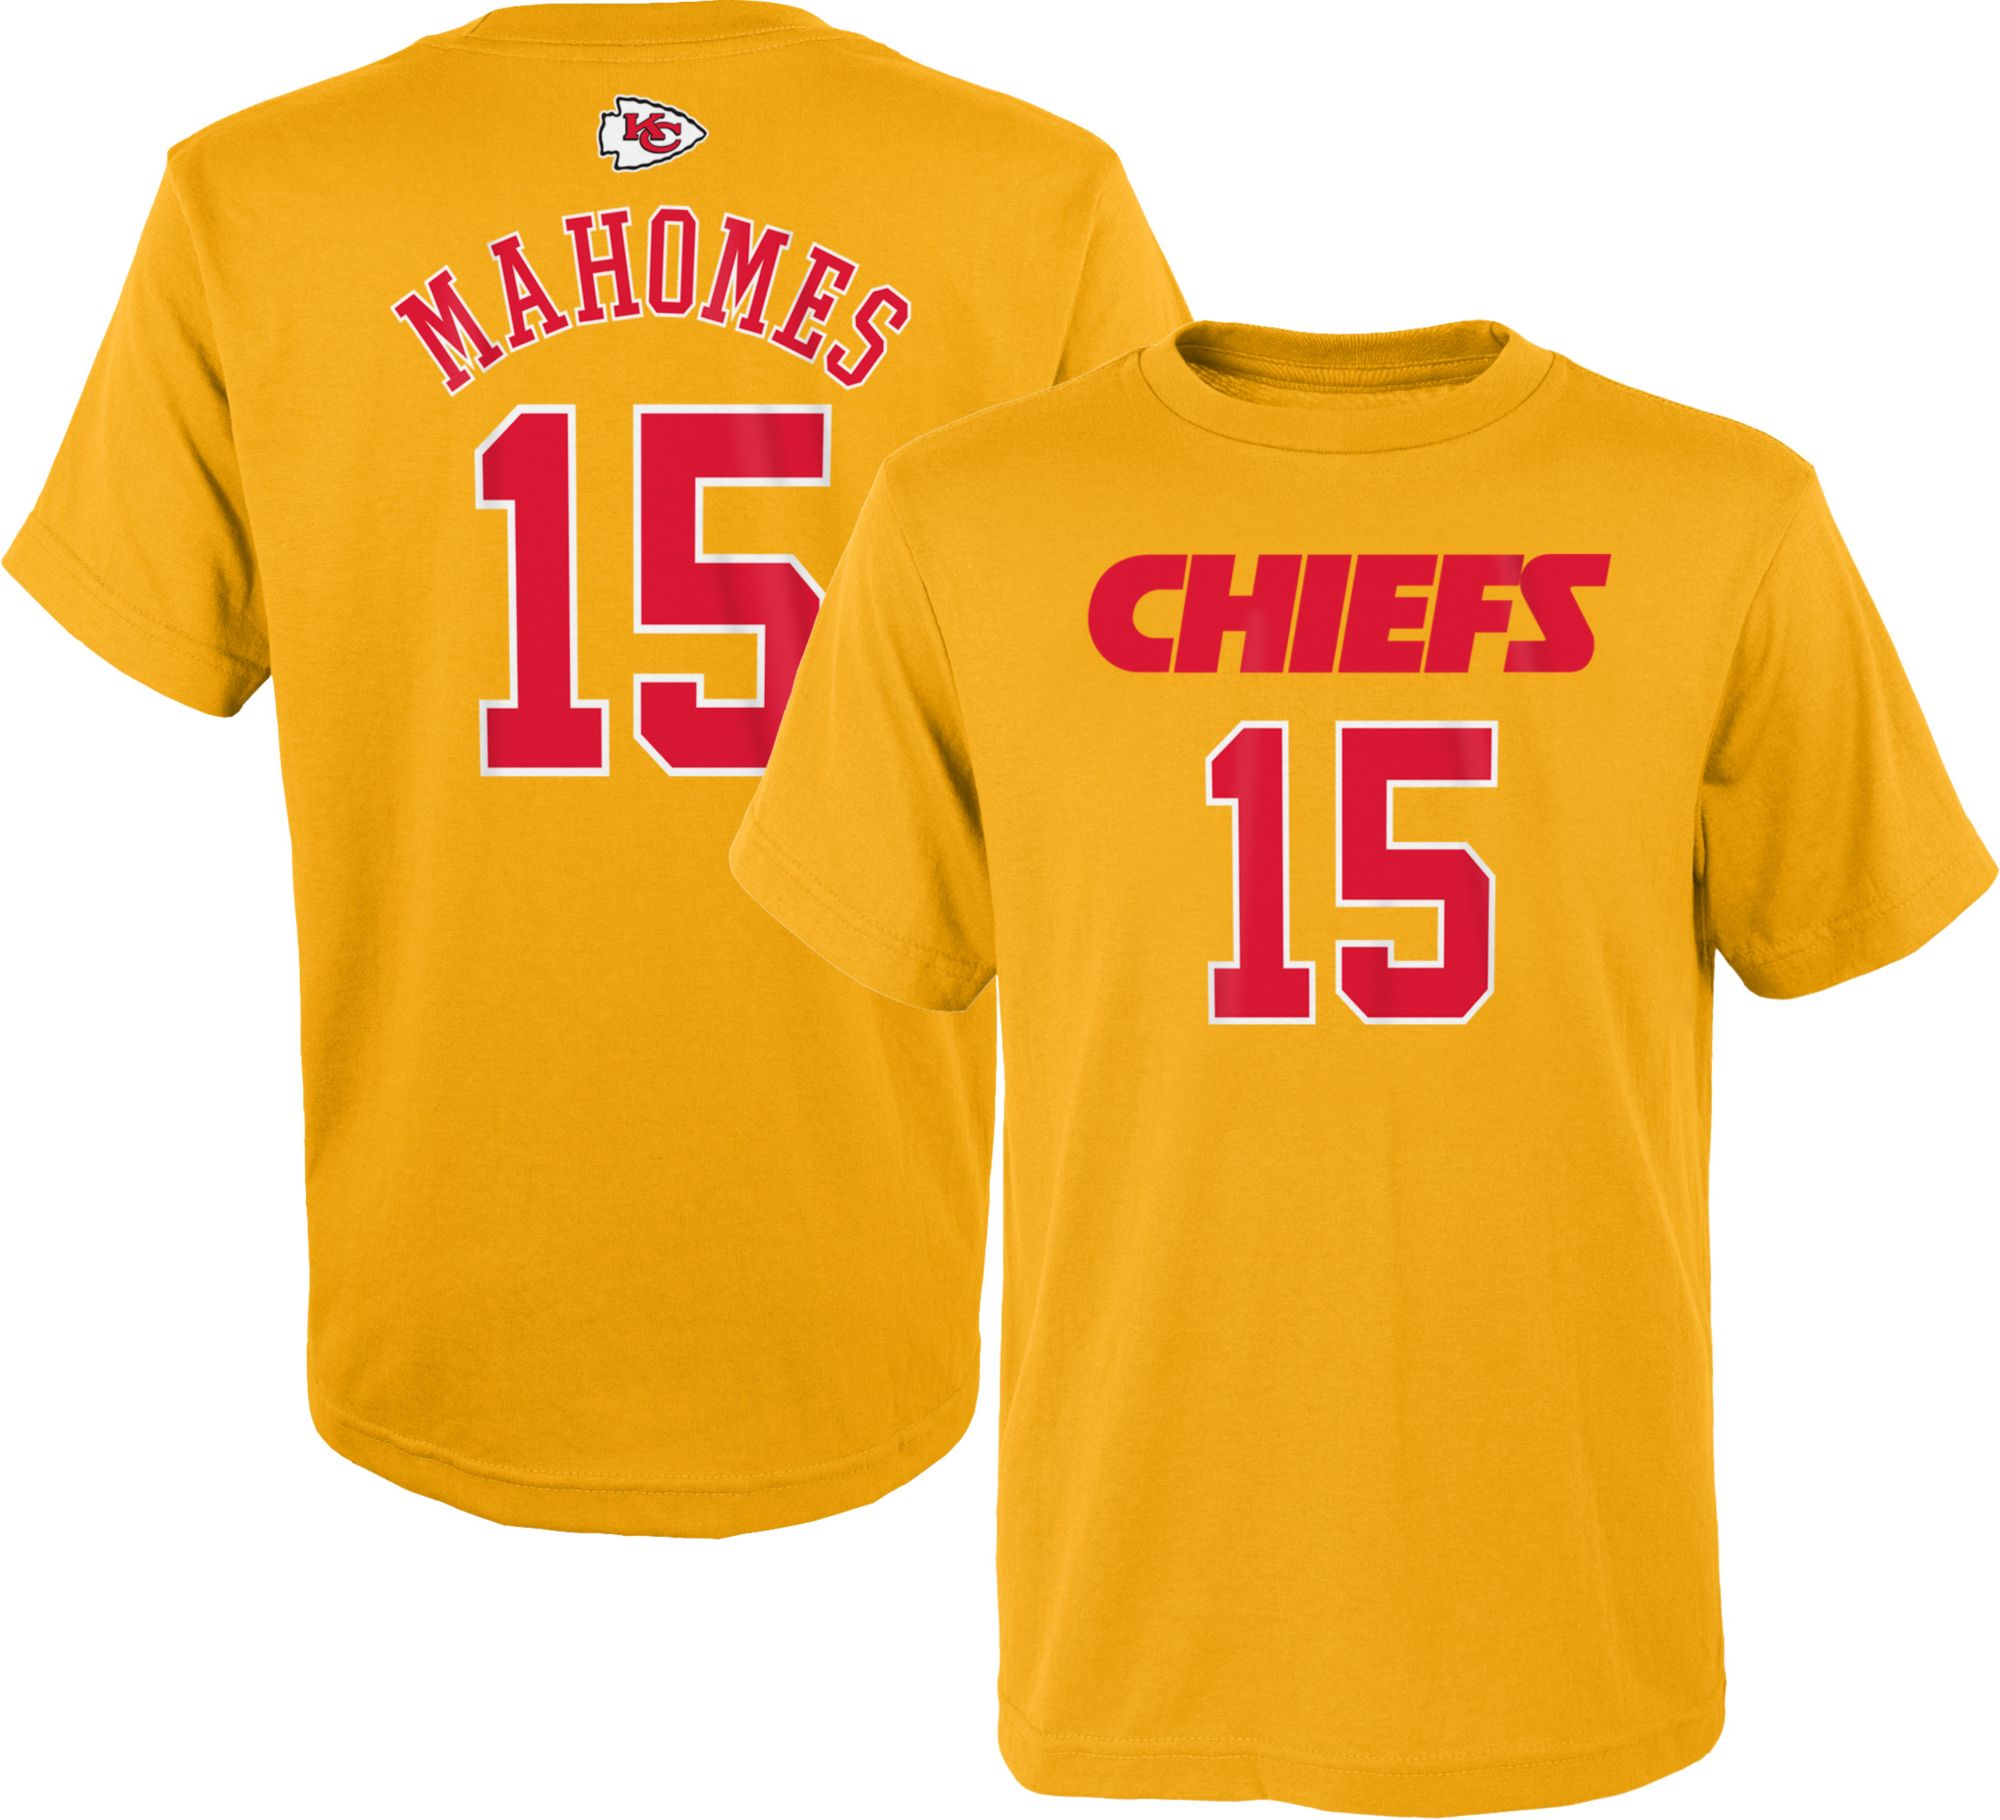 kansas city chiefs yellow jersey